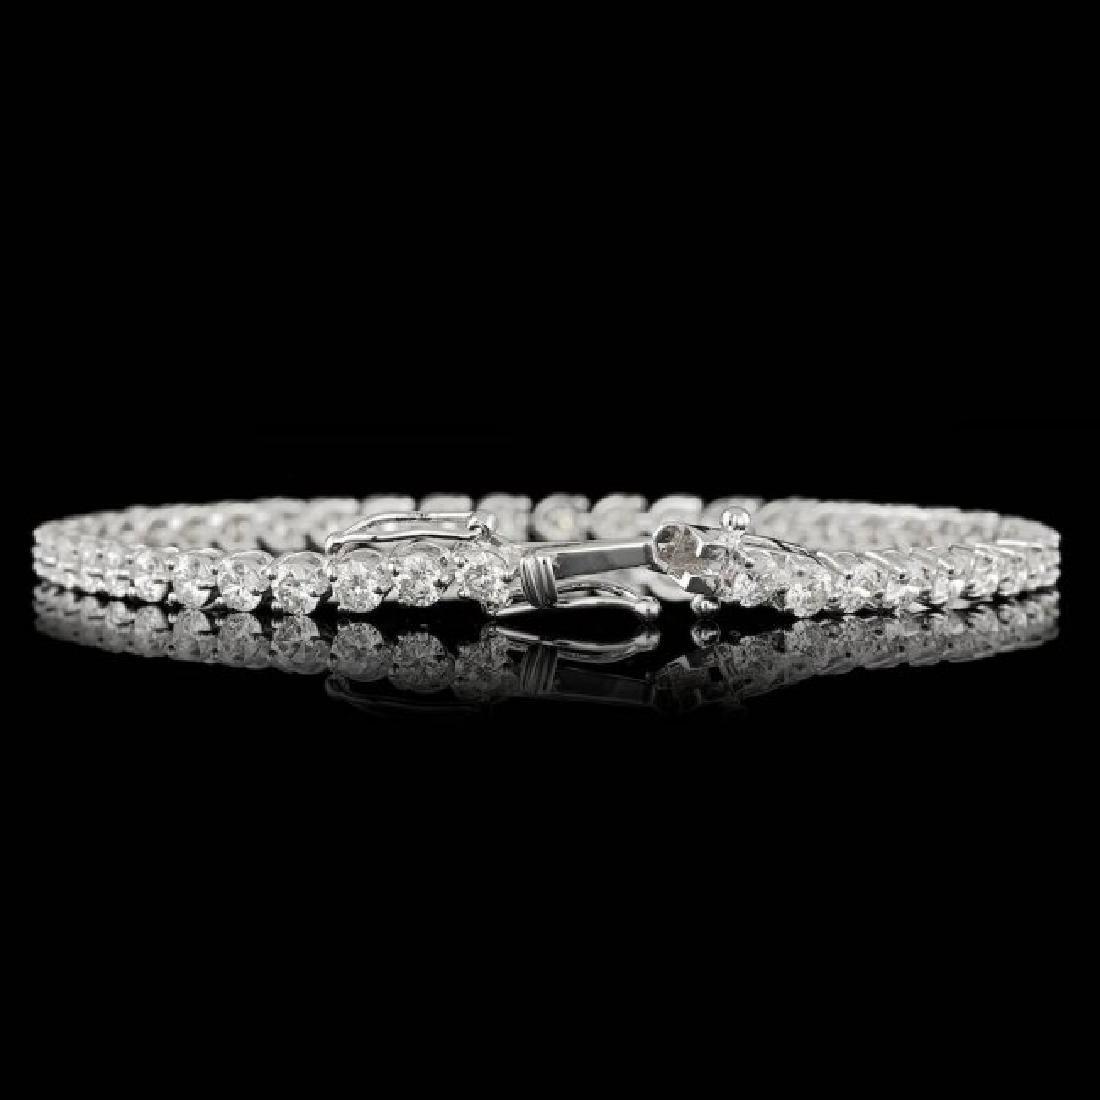 18k White Gold 6.25ct Diamond Bracelet - 2